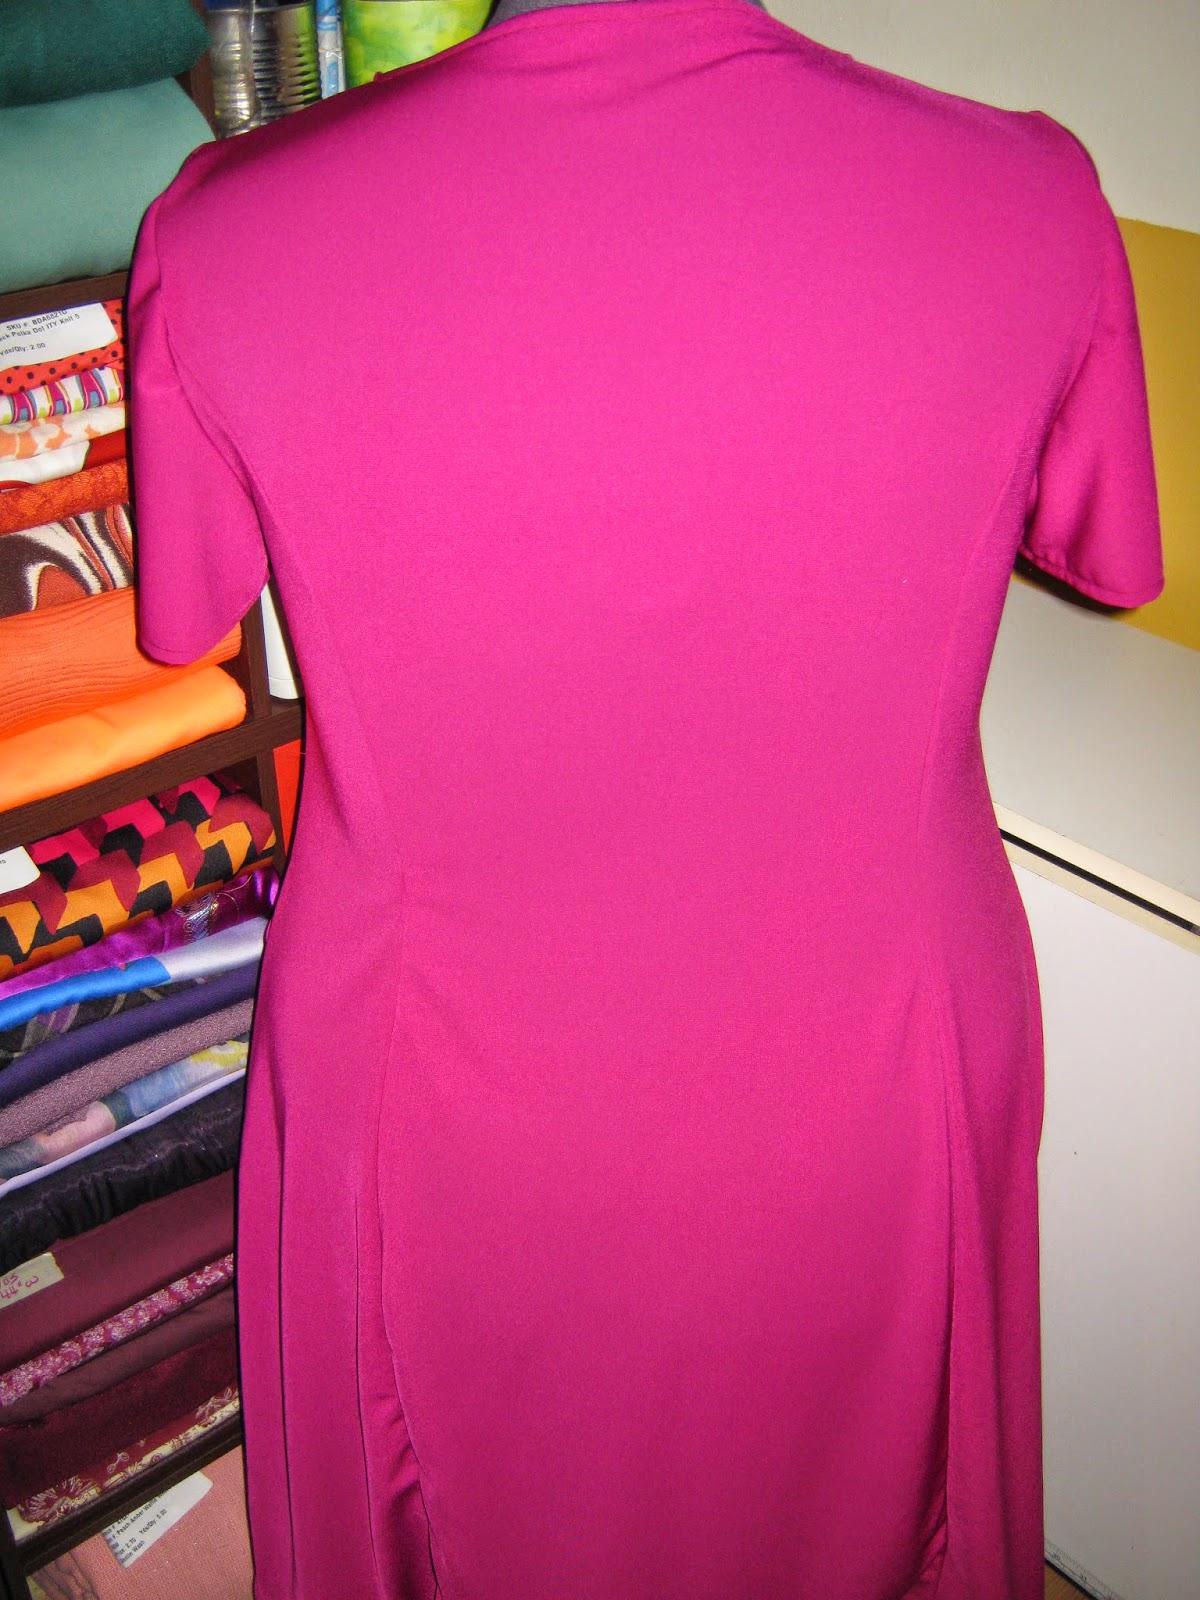 Simplicity 7243 Fuchsia Dress www.sewplus.blogspot.com